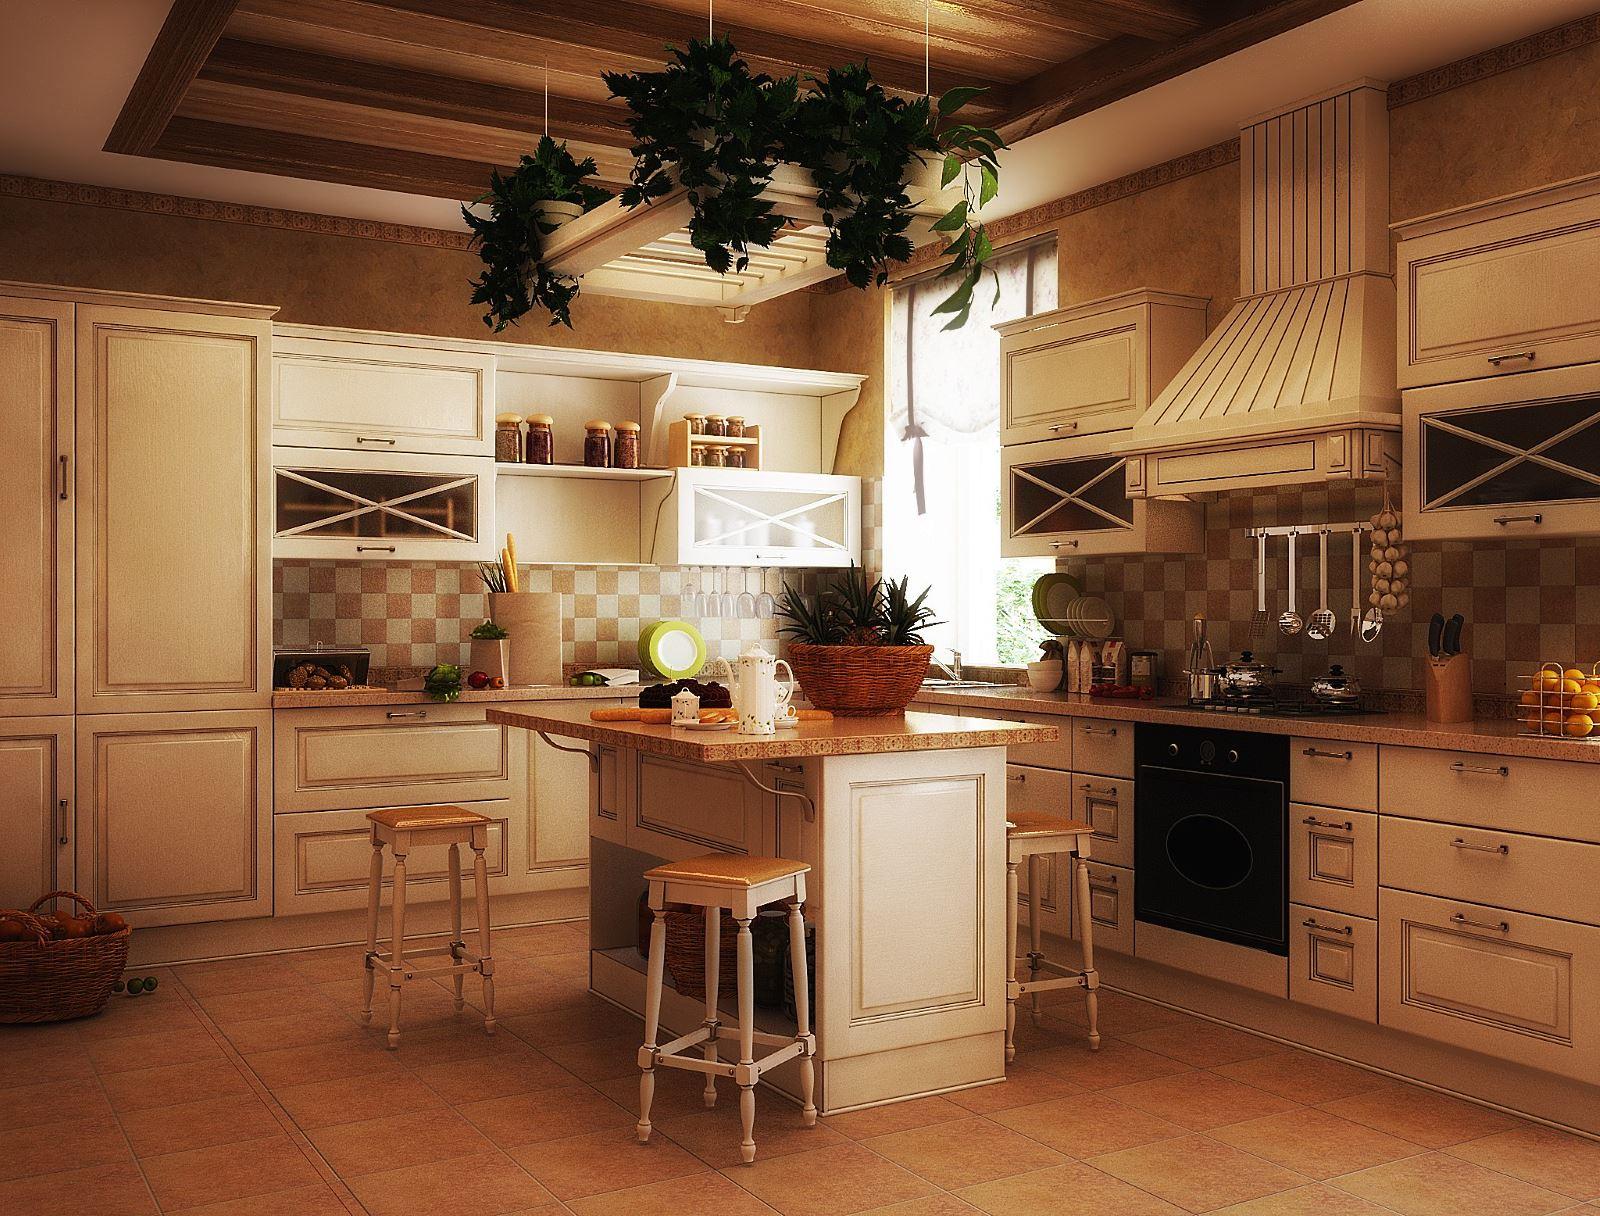 Кухня в стиле кантри фото интерьер своими руками фото 63